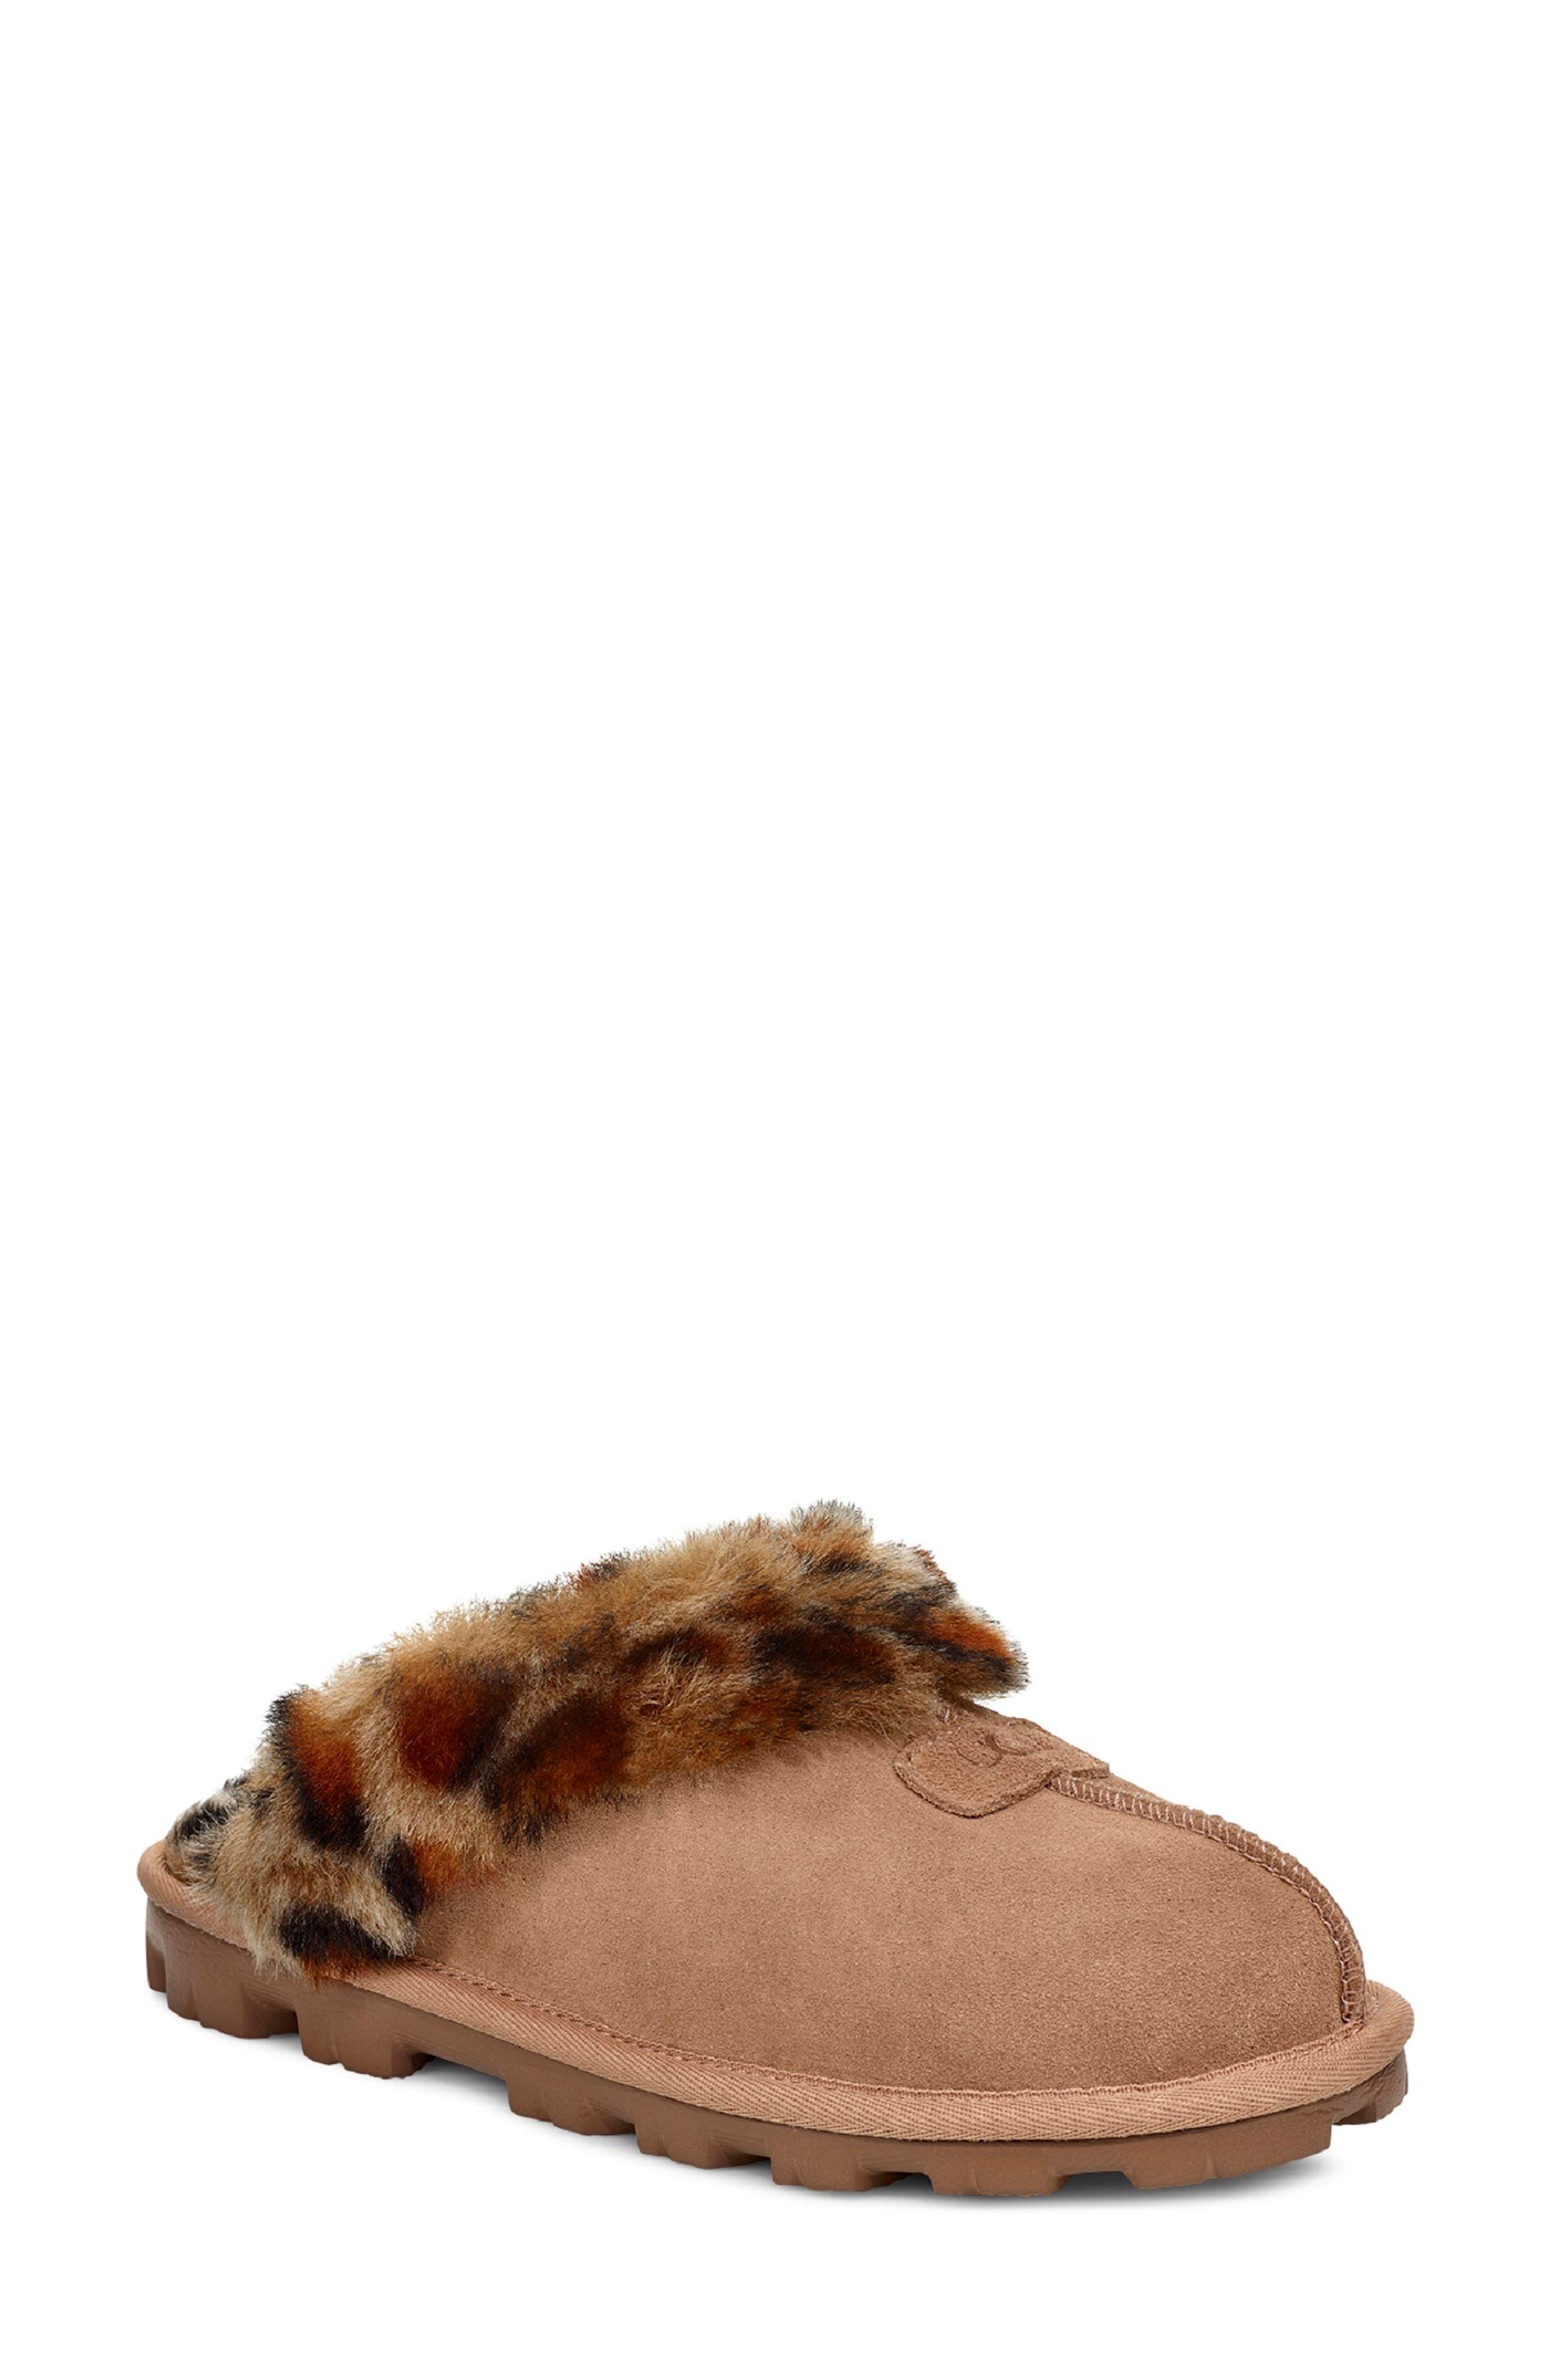 2b5b416c Women's Comfortable Shoes | Nordstrom